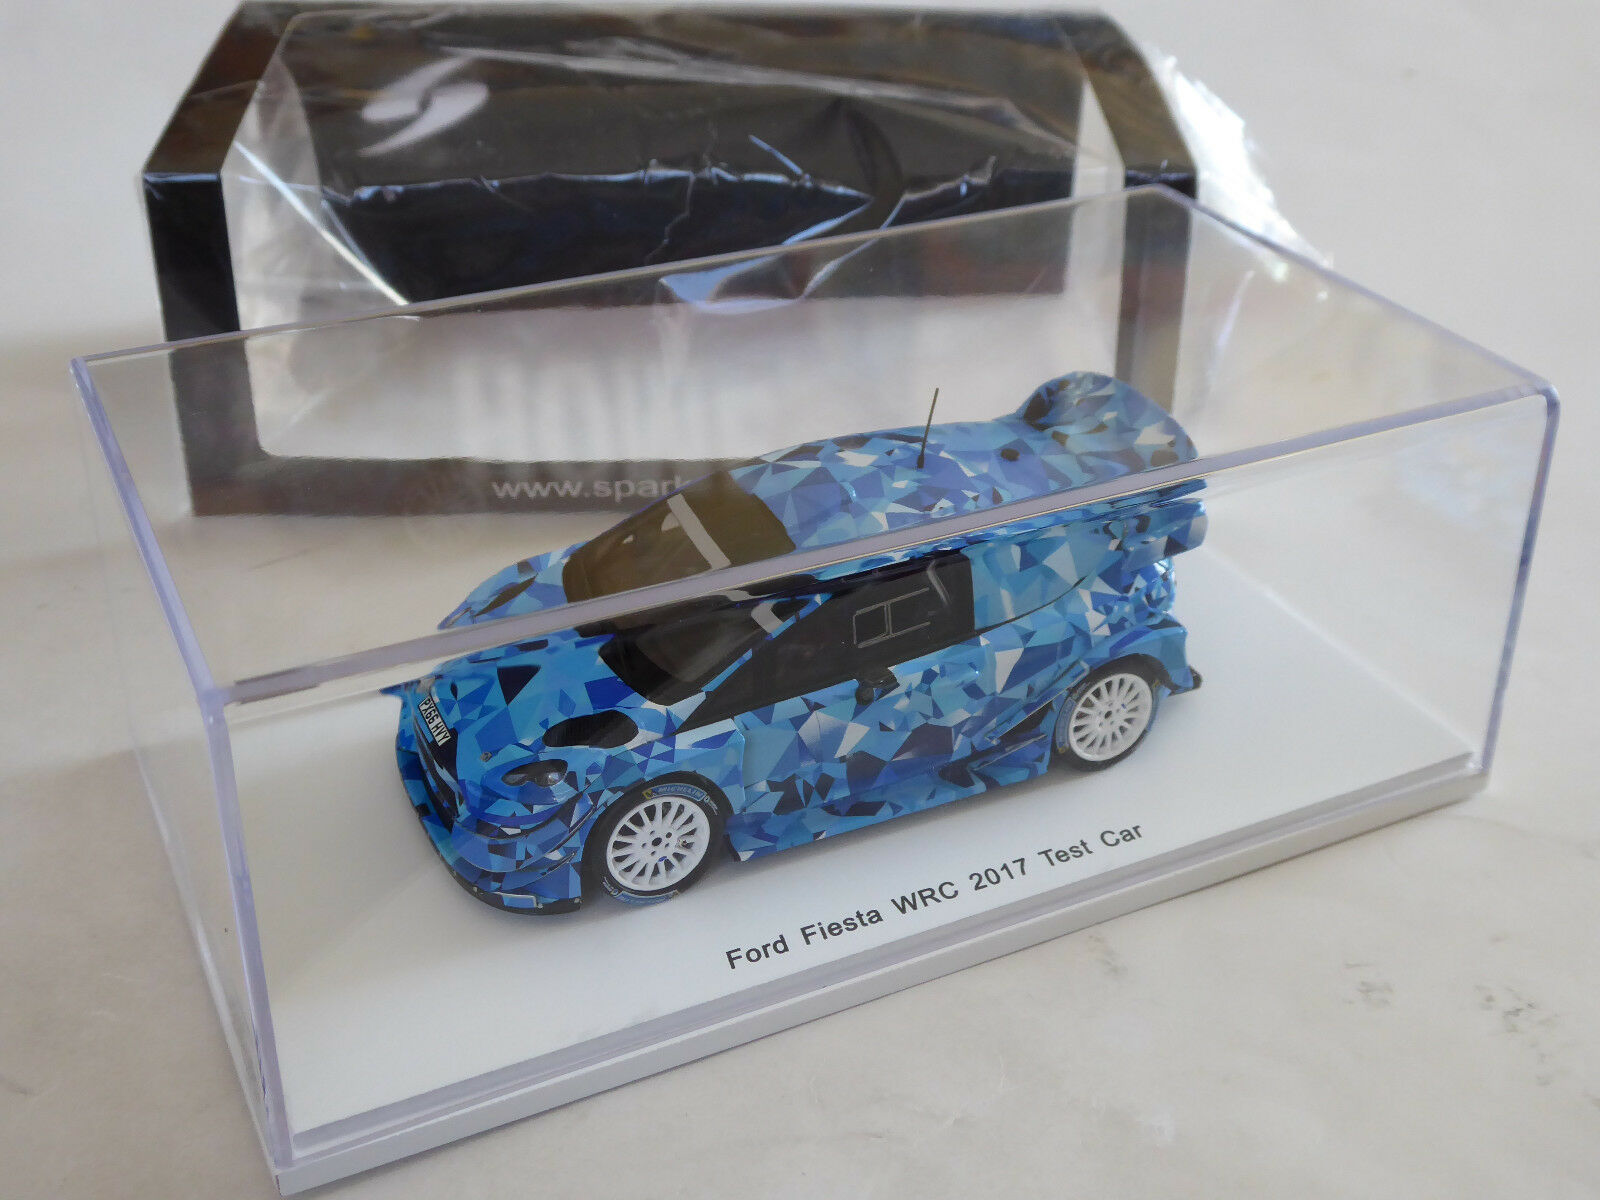 SPARK 1  43 FORD FIESTA WRC RALLYE test voiture 2017 M-SPORT Ogier Tänak neuf dans sa boîte s5157  grande remise